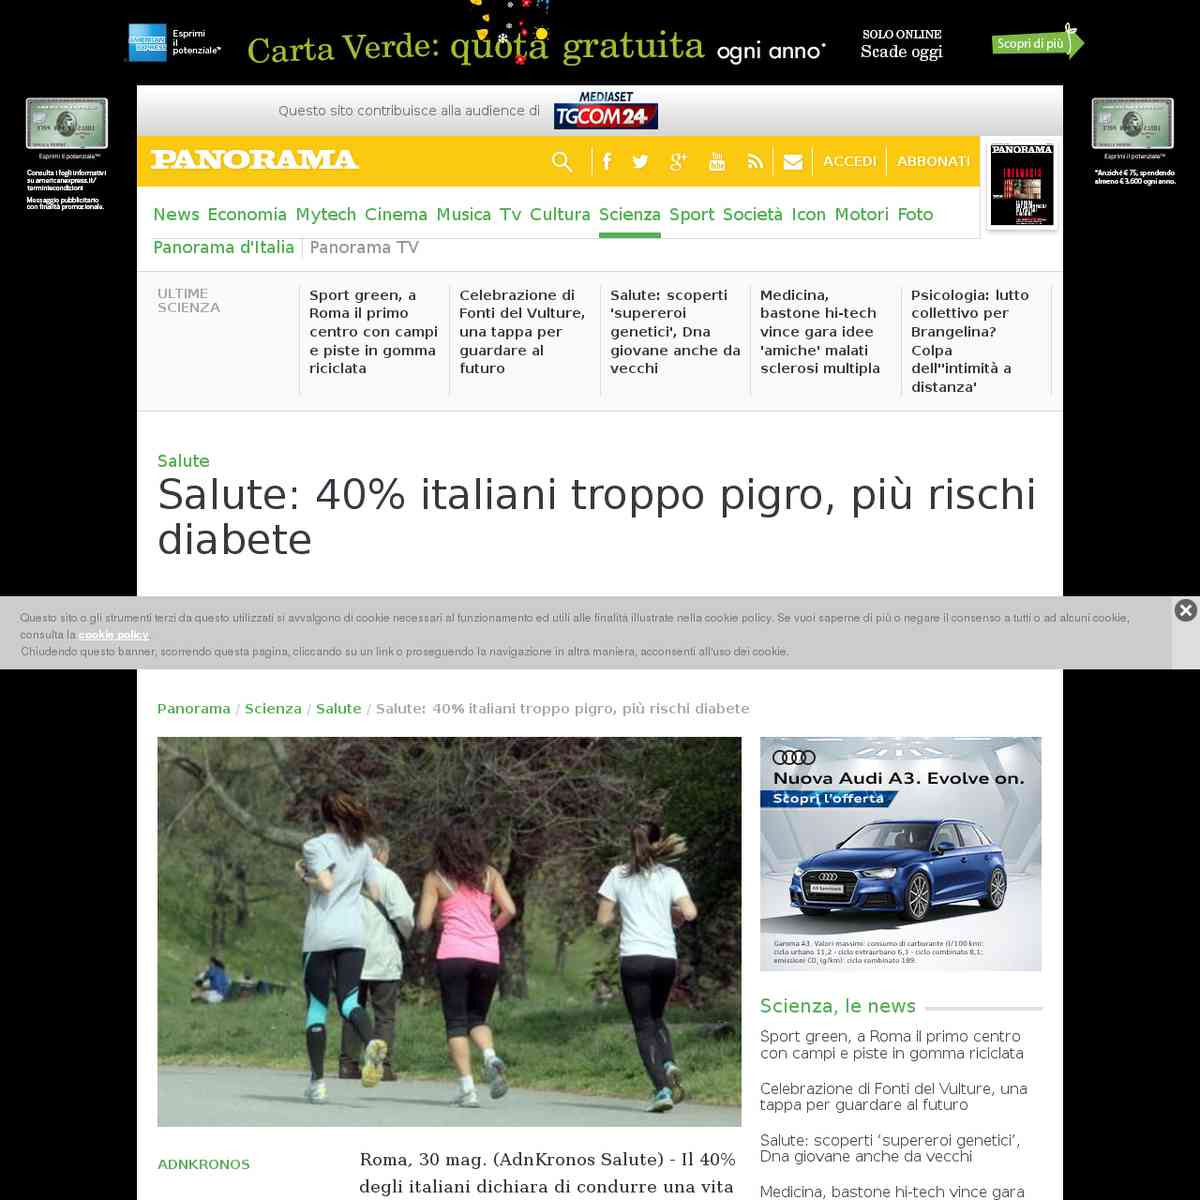 Salute: 40% italiani troppo pigro, più rischi diabete - Panorama - 30/05/2016